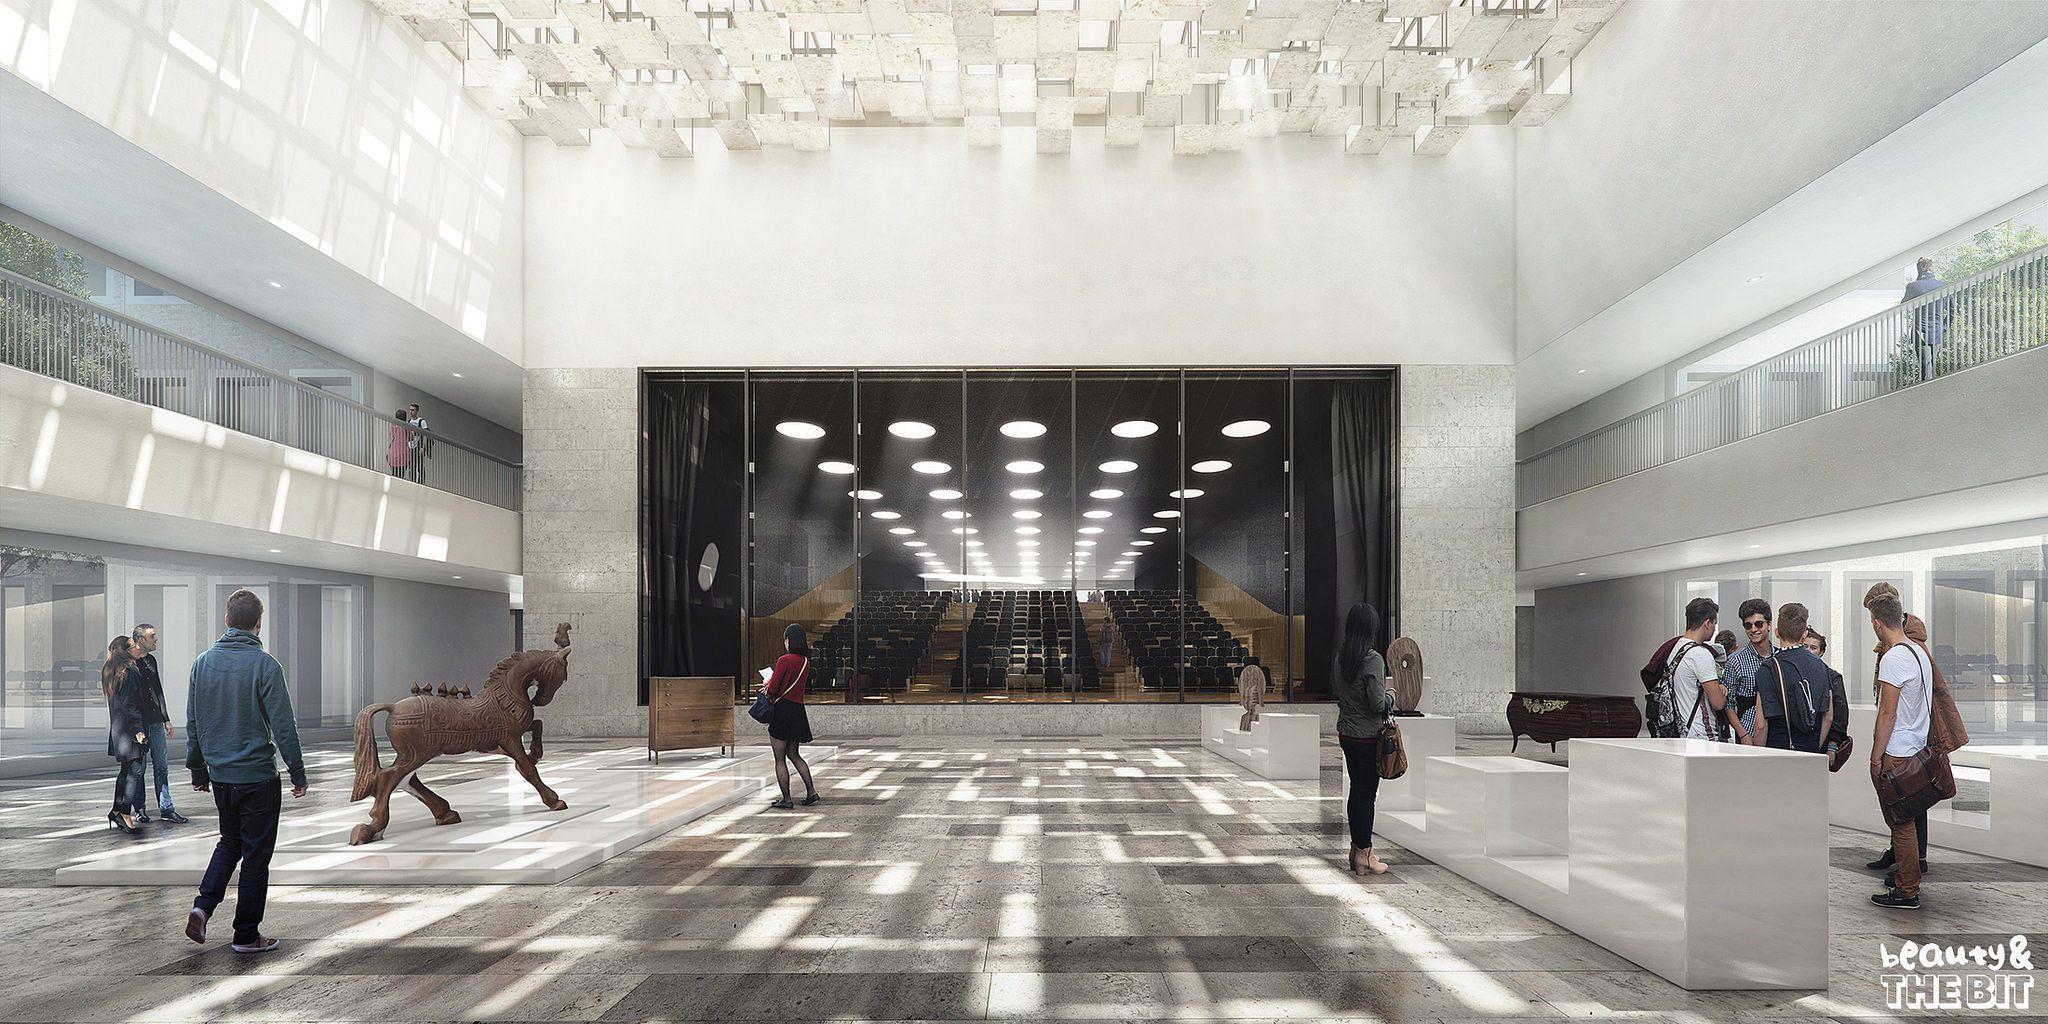 Chambre De Metiers Et De L Artisanat Cma France Kaan Architecten 2015 Interior Rendering Office Space Design Visualisation